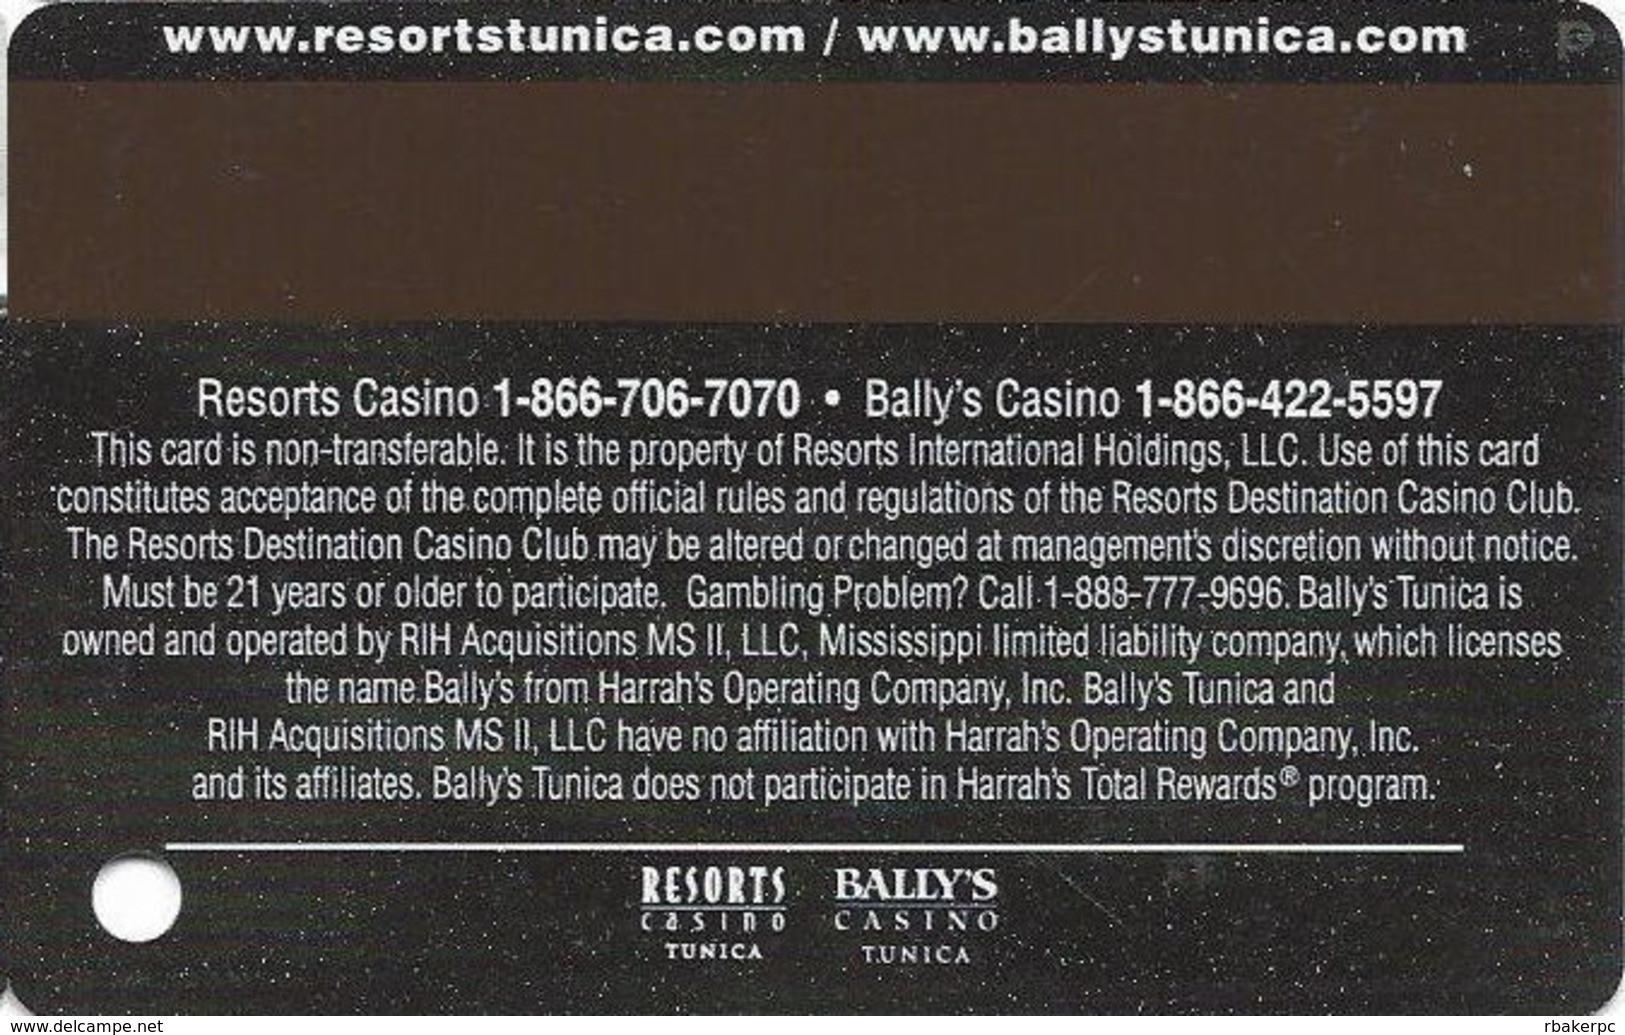 Resorts & Bally's Casinos - Tunica, MS - Slot Card - 2 Logos On Reverse - Casino Cards